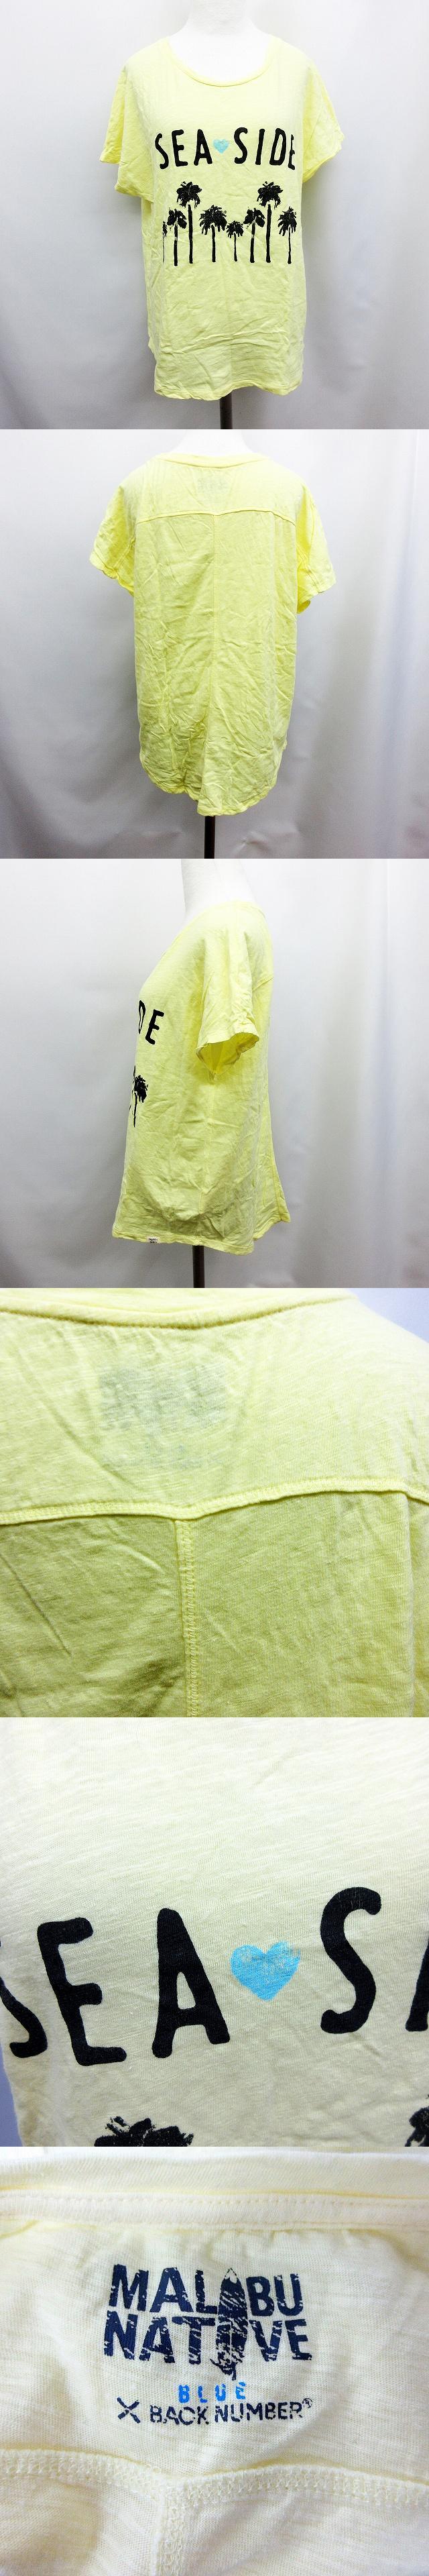 × MALIBU NATIVE Tシャツ カットソー 半袖 ヤシの木 プリント M 黄色 イエロー系